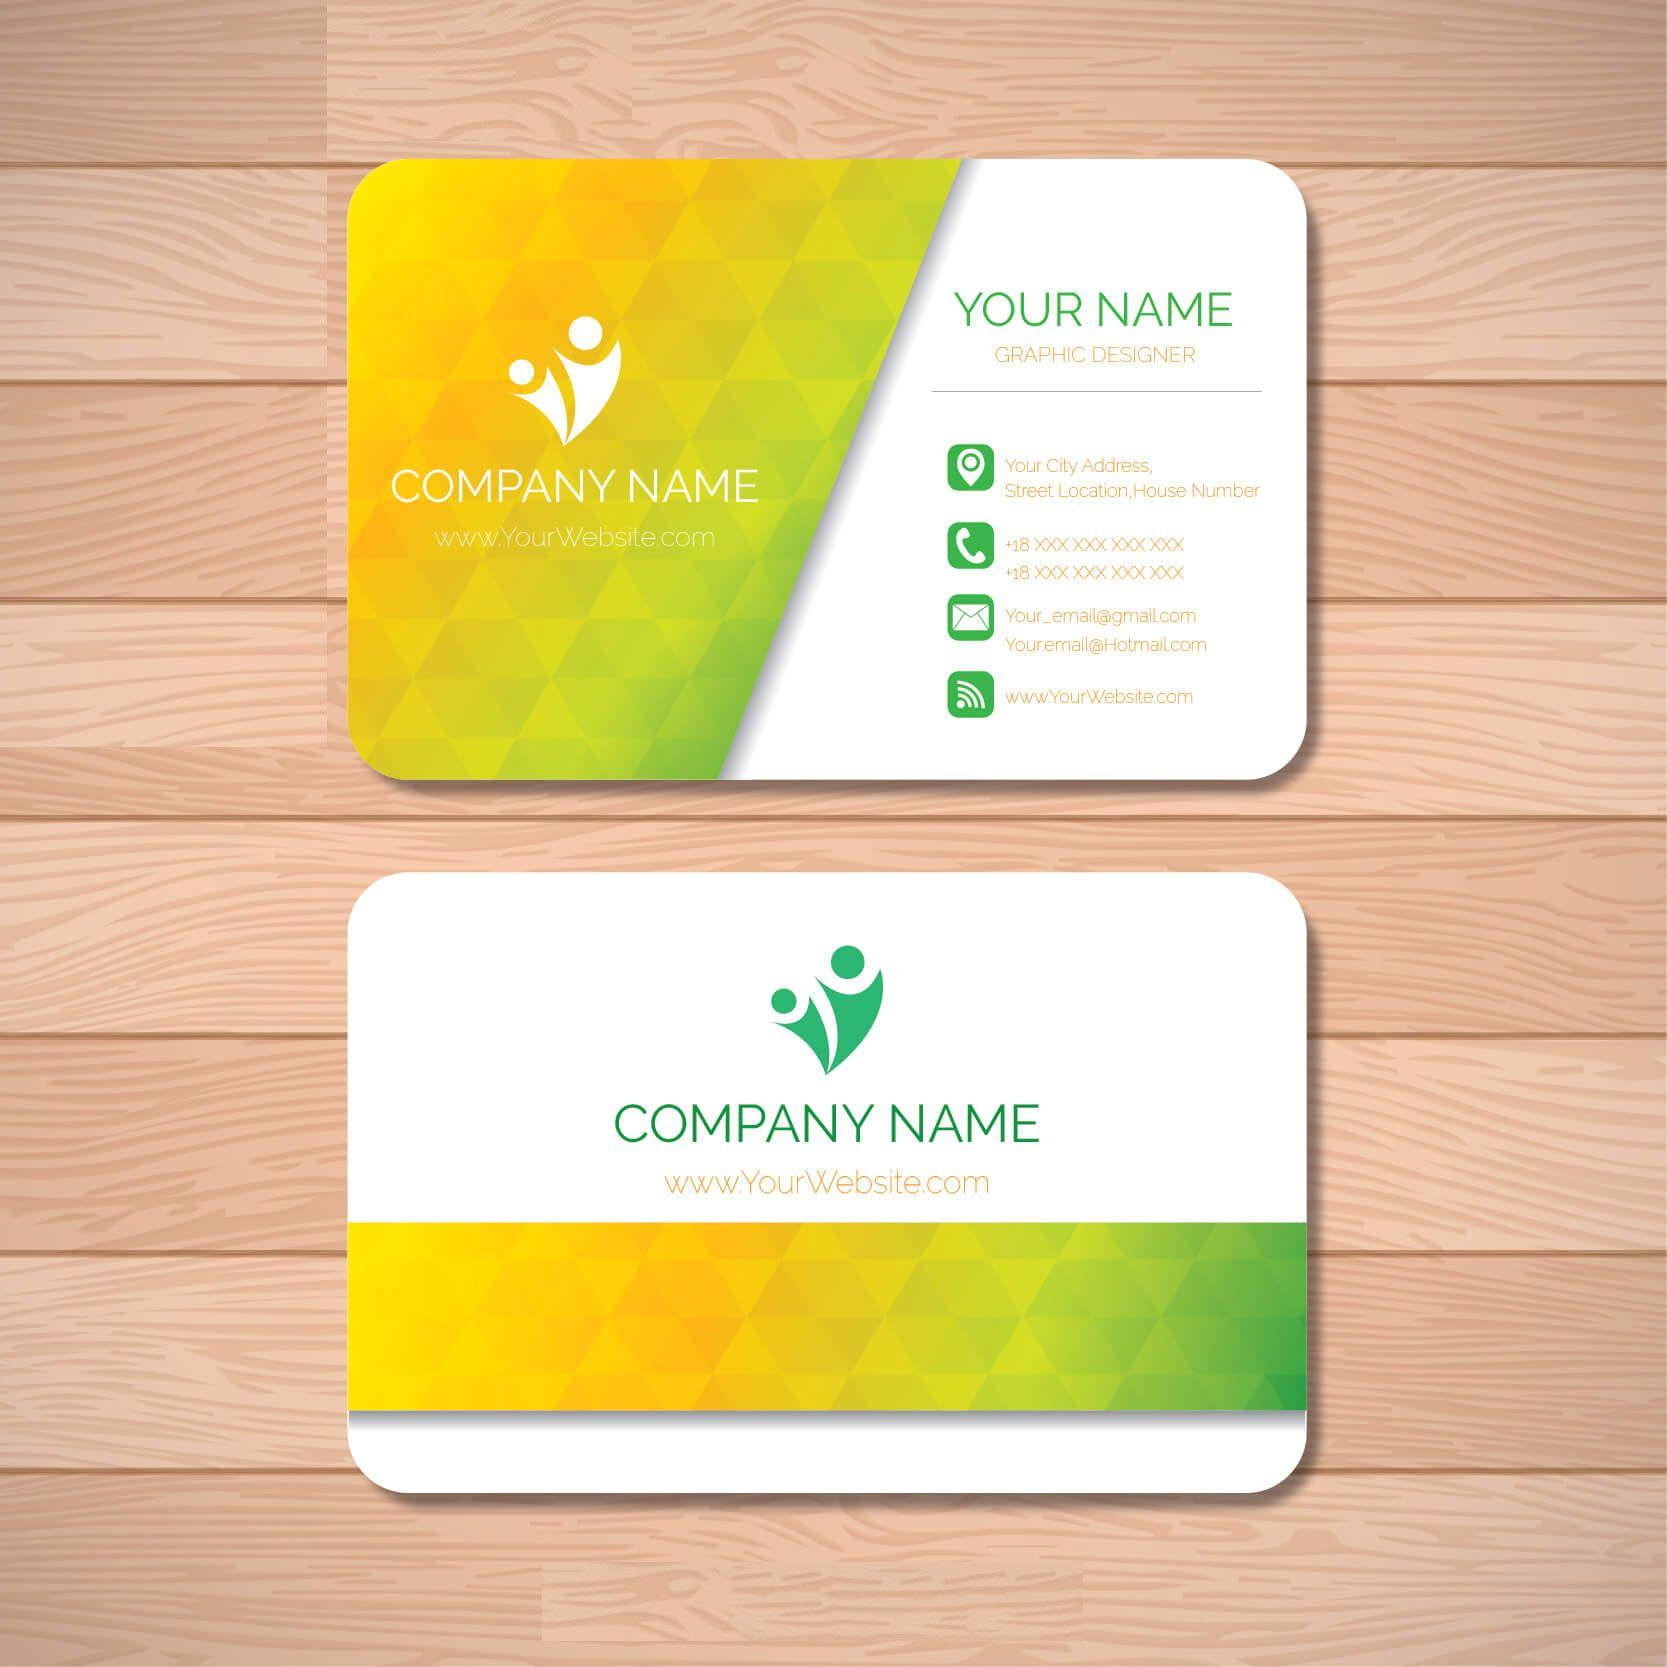 business card sample design http:49designersportfolio21